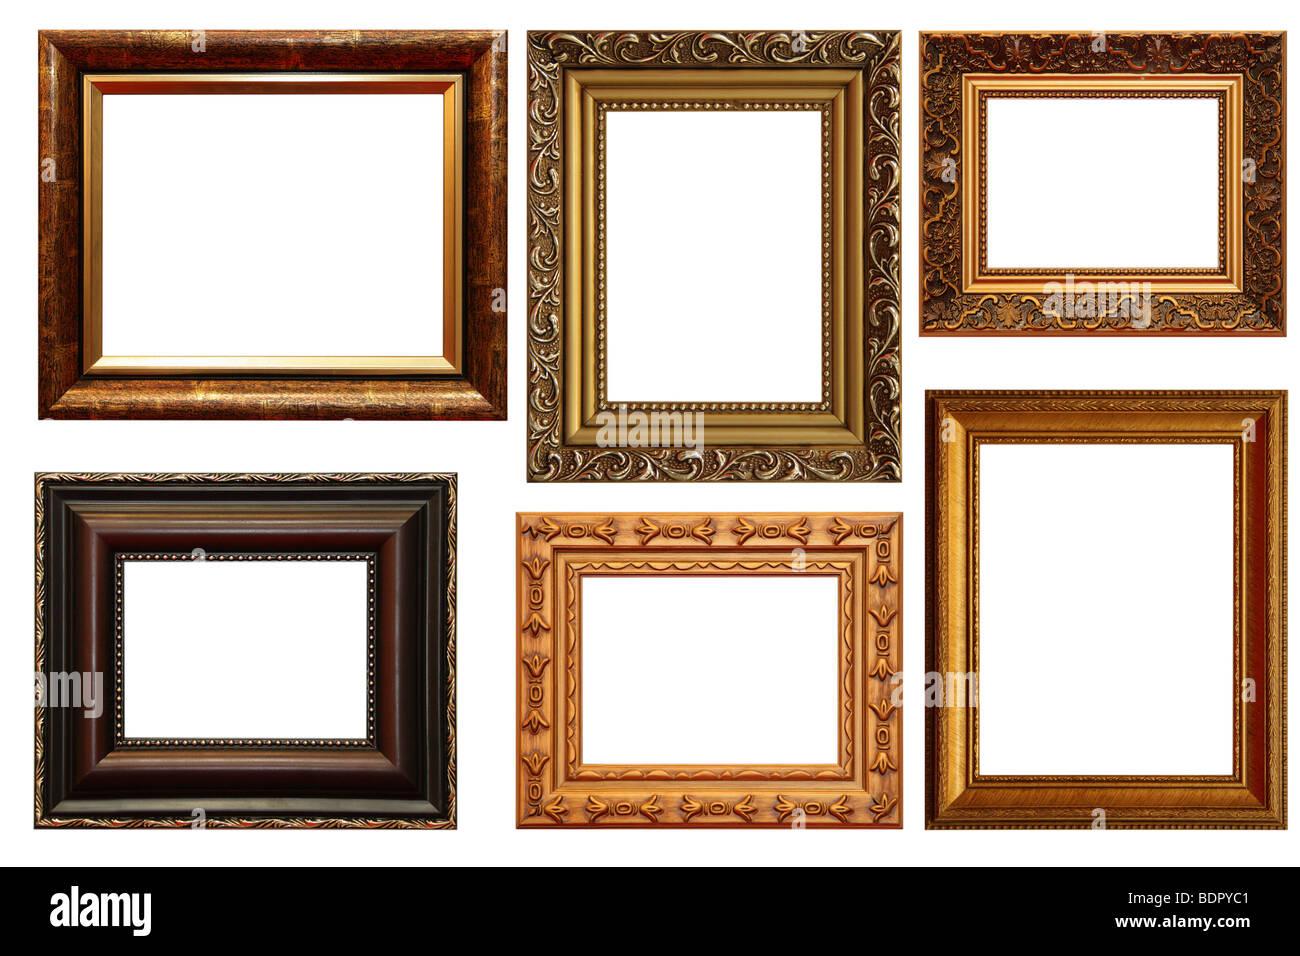 bilderrahmen stockfotos bilderrahmen bilder alamy. Black Bedroom Furniture Sets. Home Design Ideas